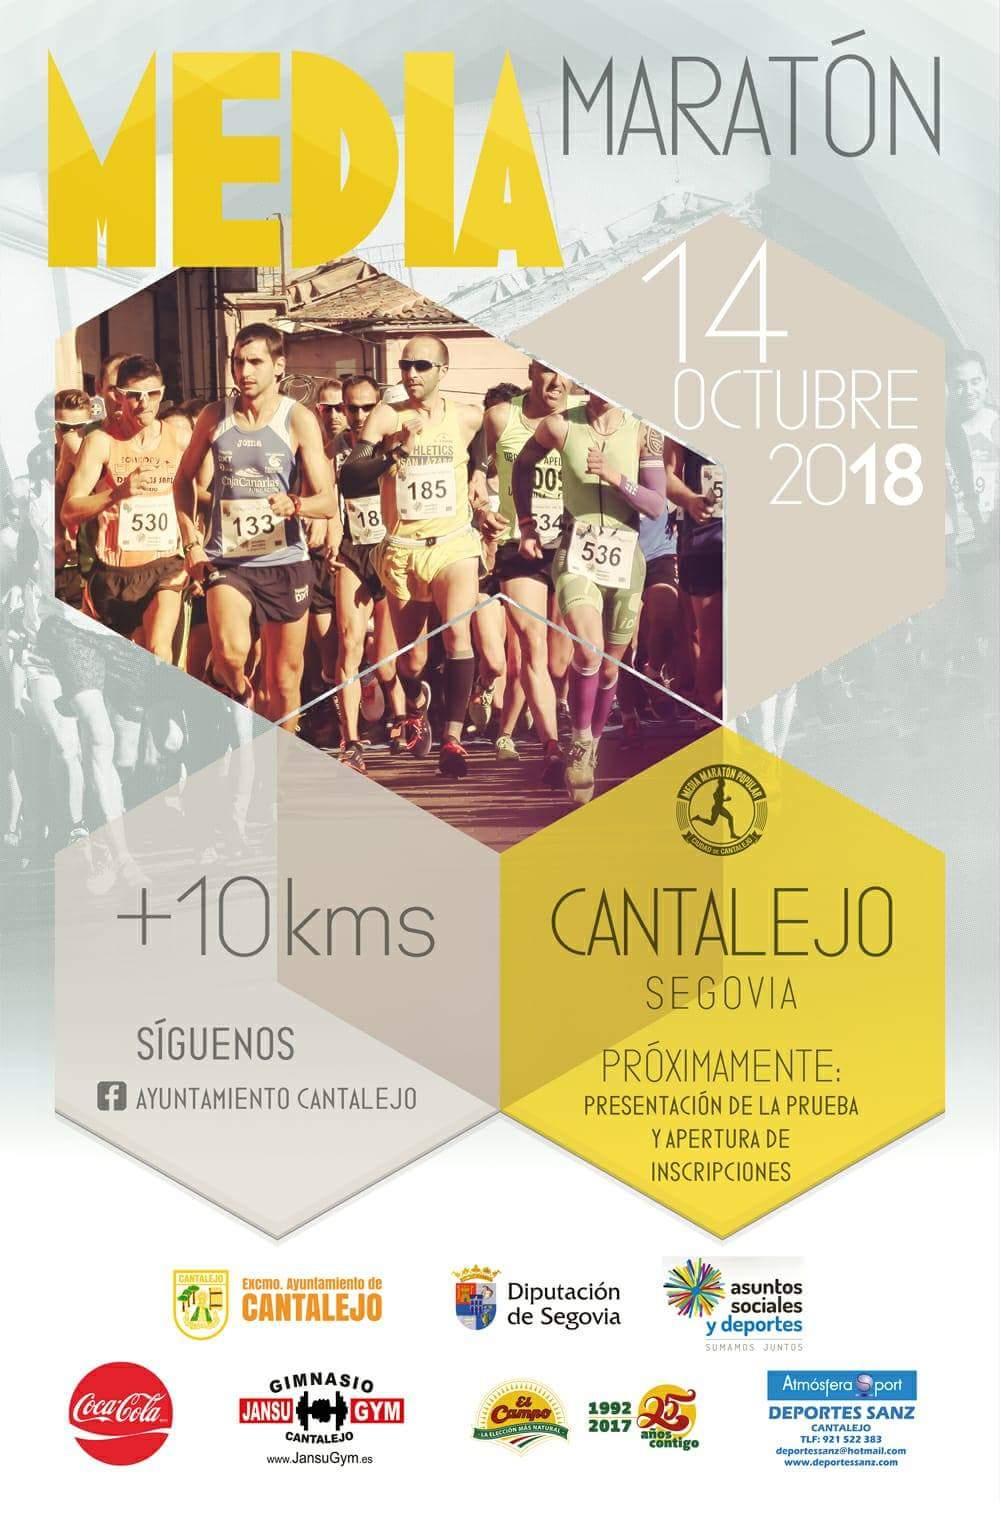 Media Maratón Cantalejo